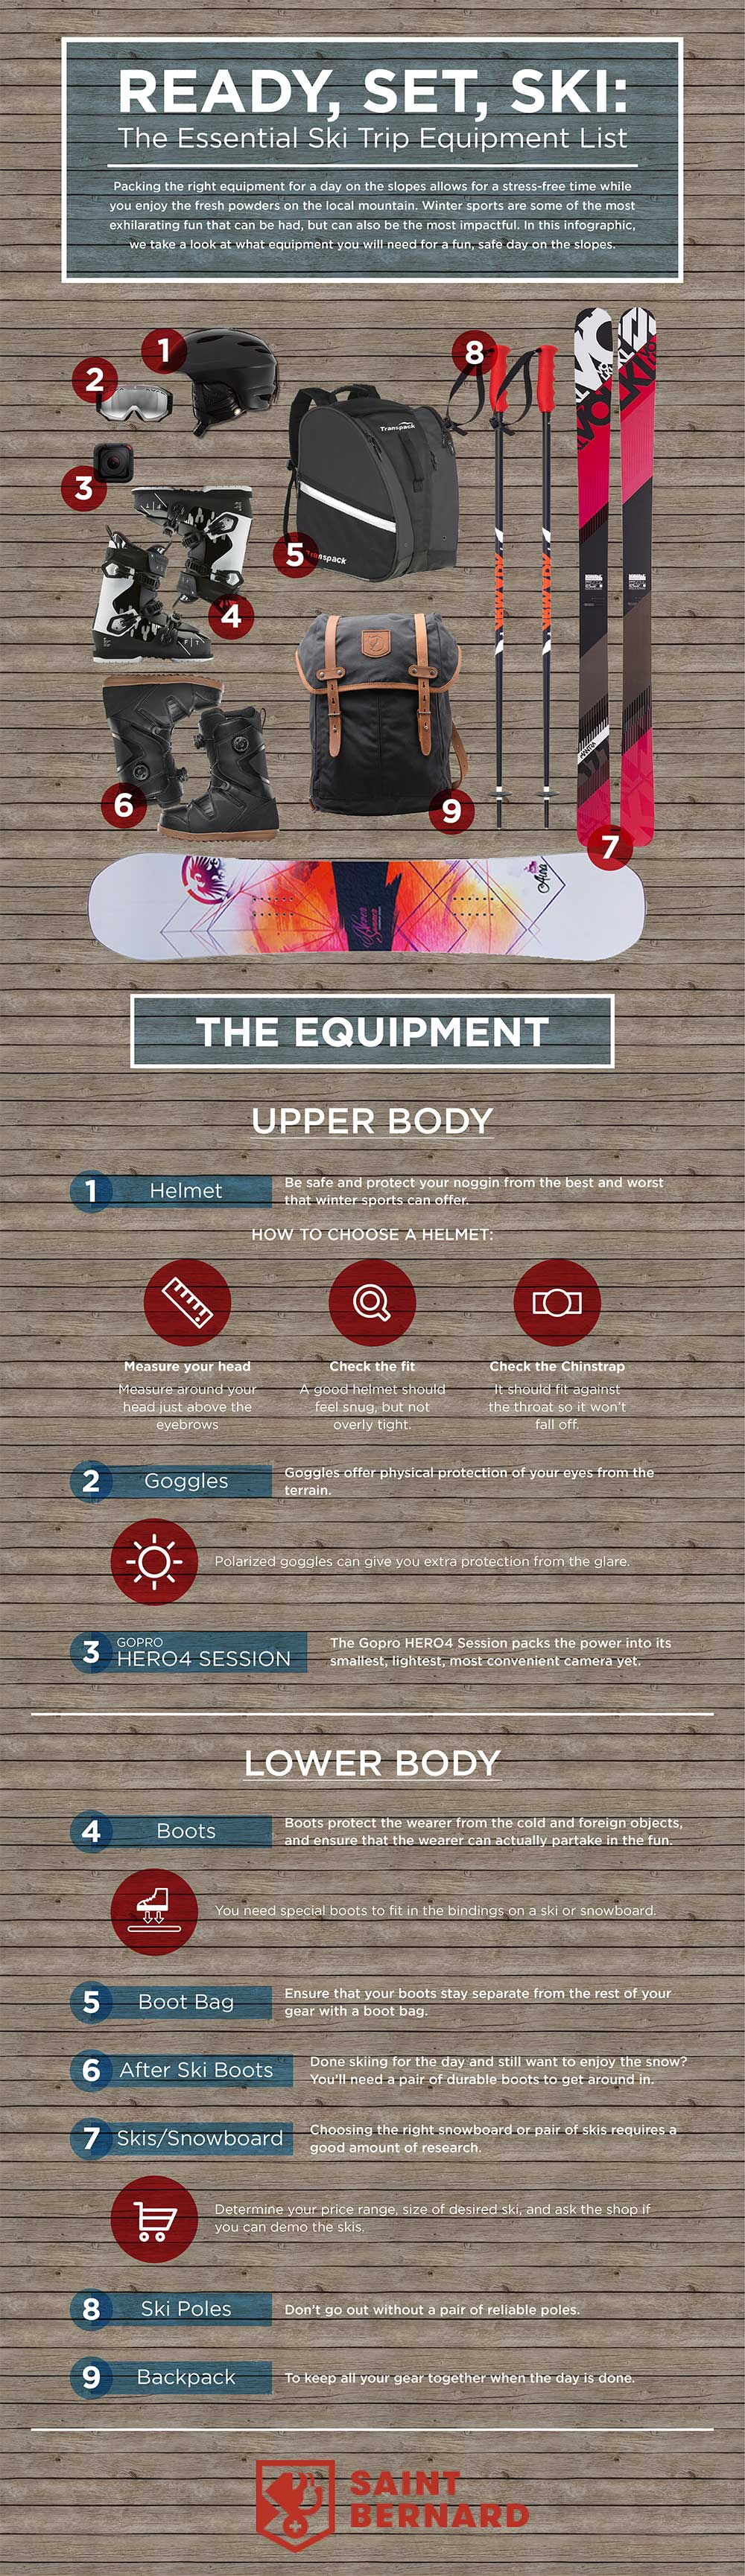 Saint Bernard Ski Checklist